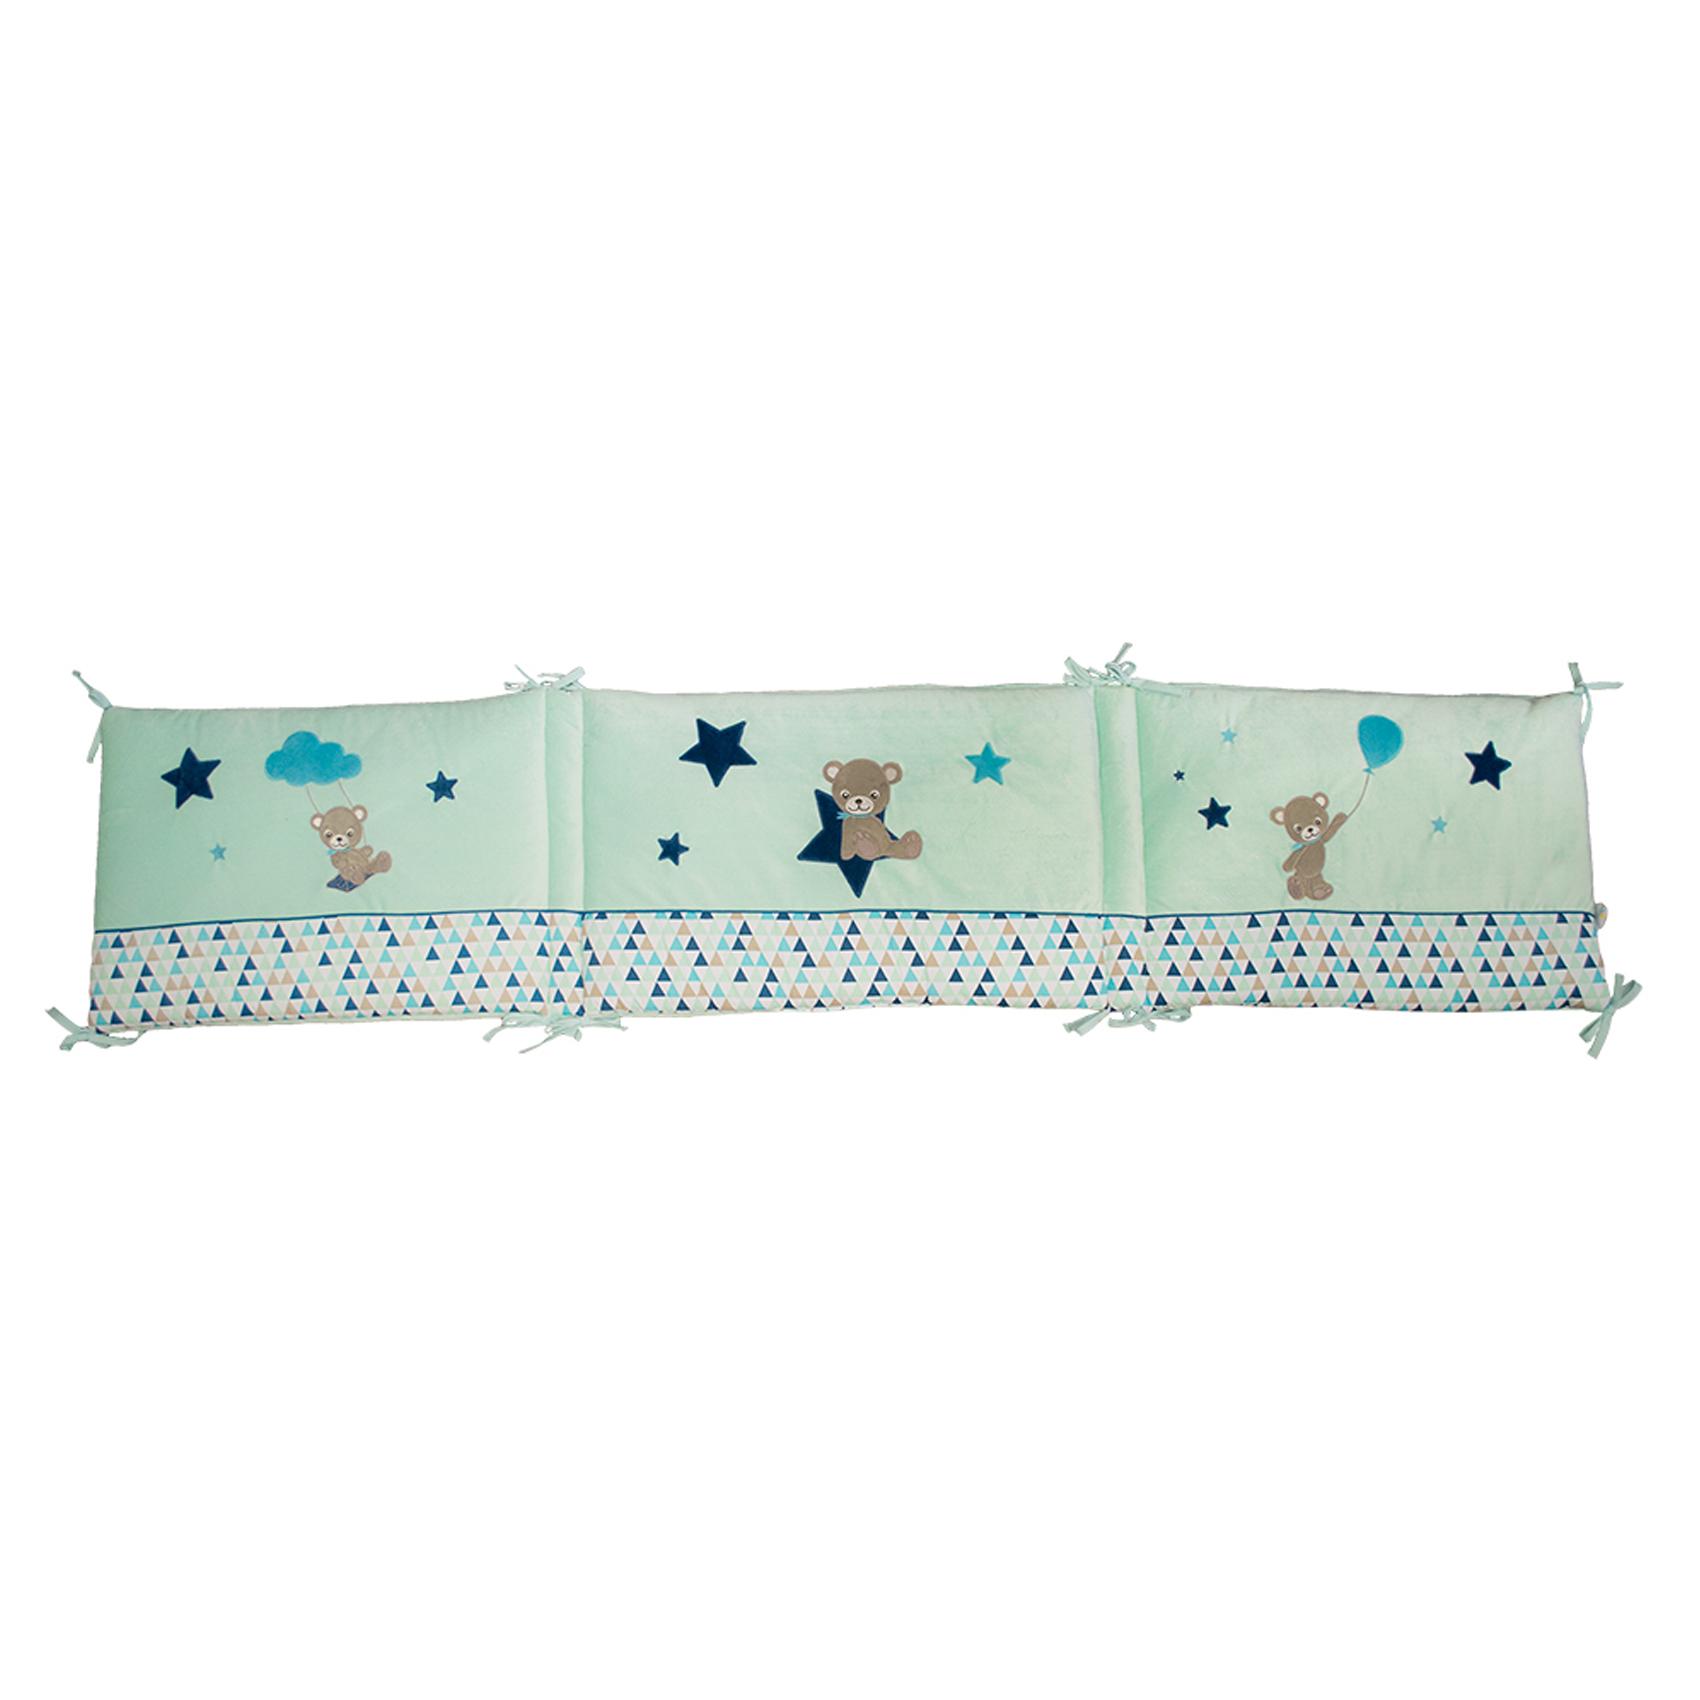 Tour de lit bébé adaptable Baby Star Bleu/Aqua 40x180